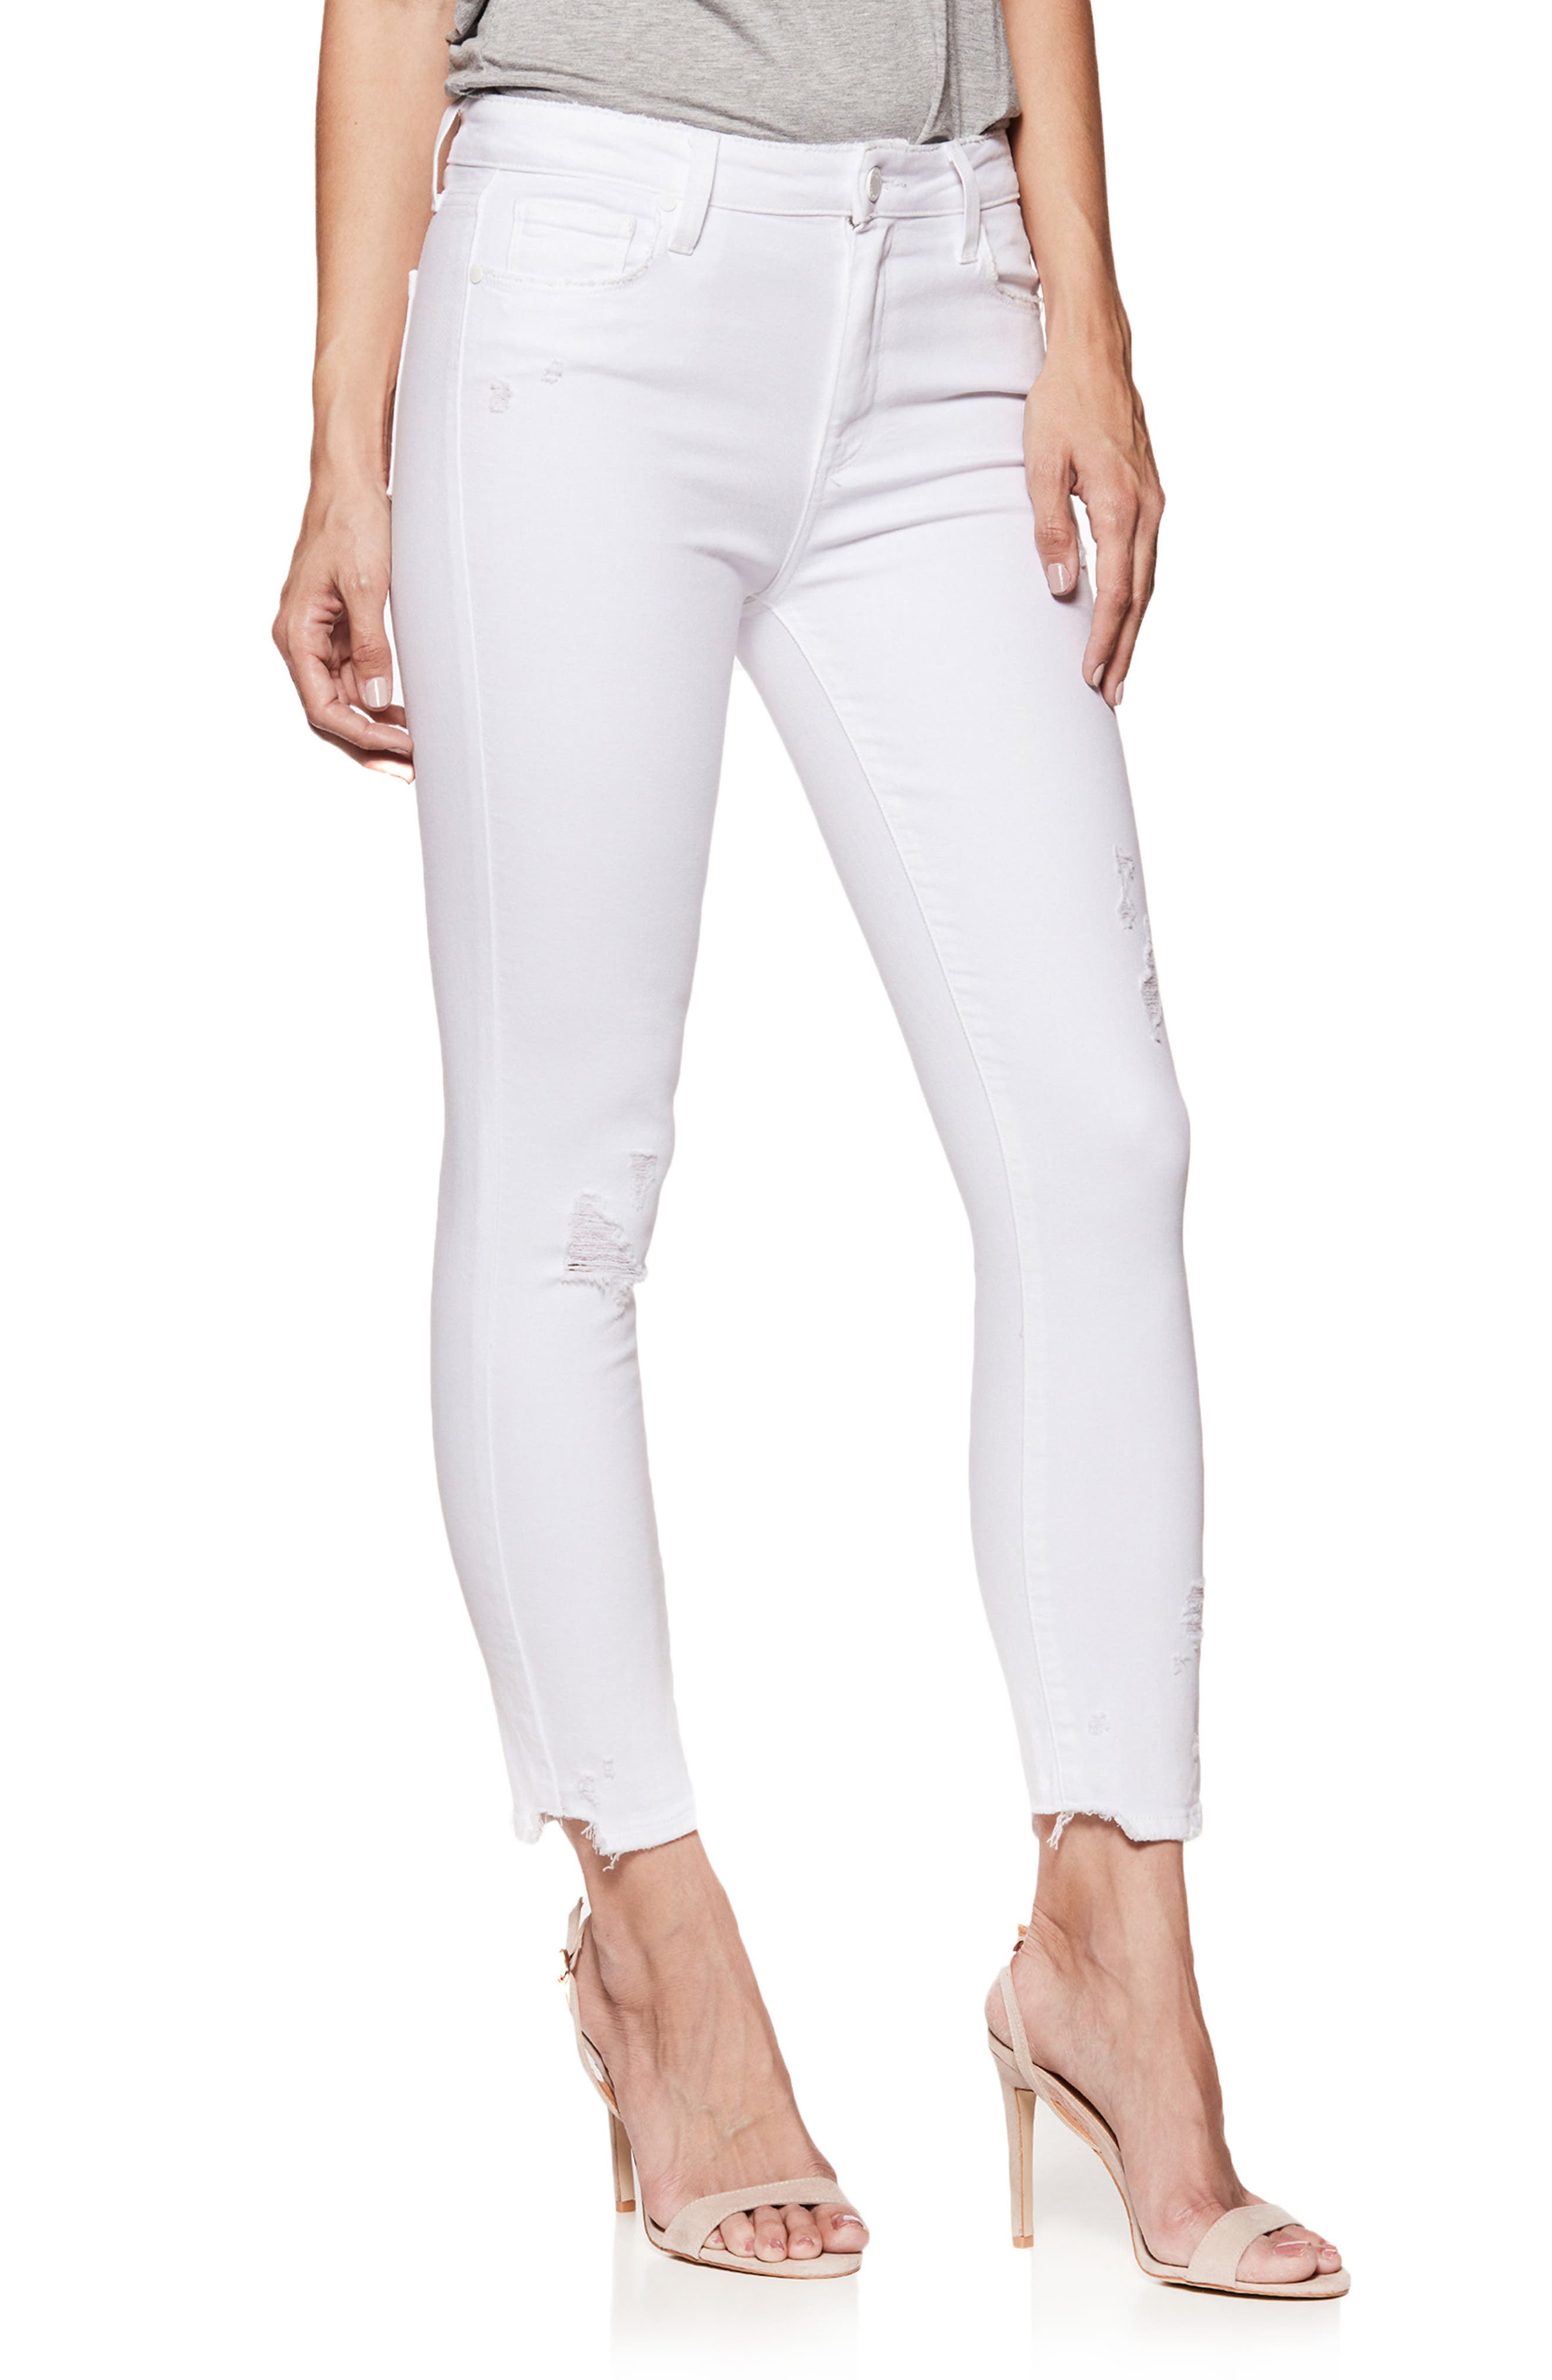 Main Image - PAIGE Hoxton High Waist Ankle Skinny Jeans (Crisp White Destructed)